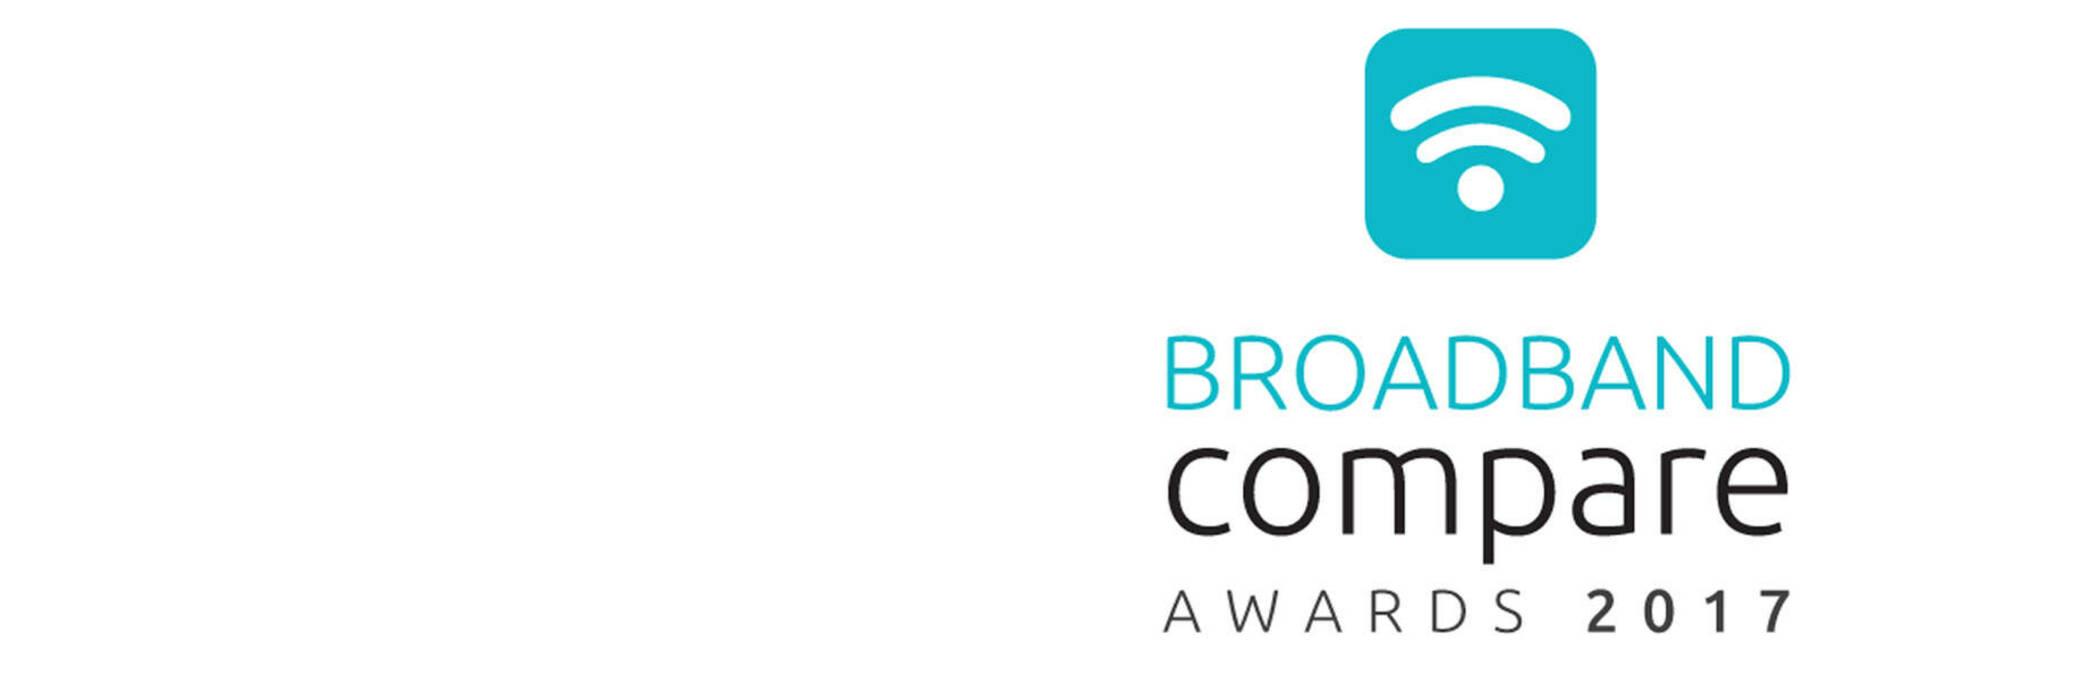 Broadband Compare Awards 2017 logo